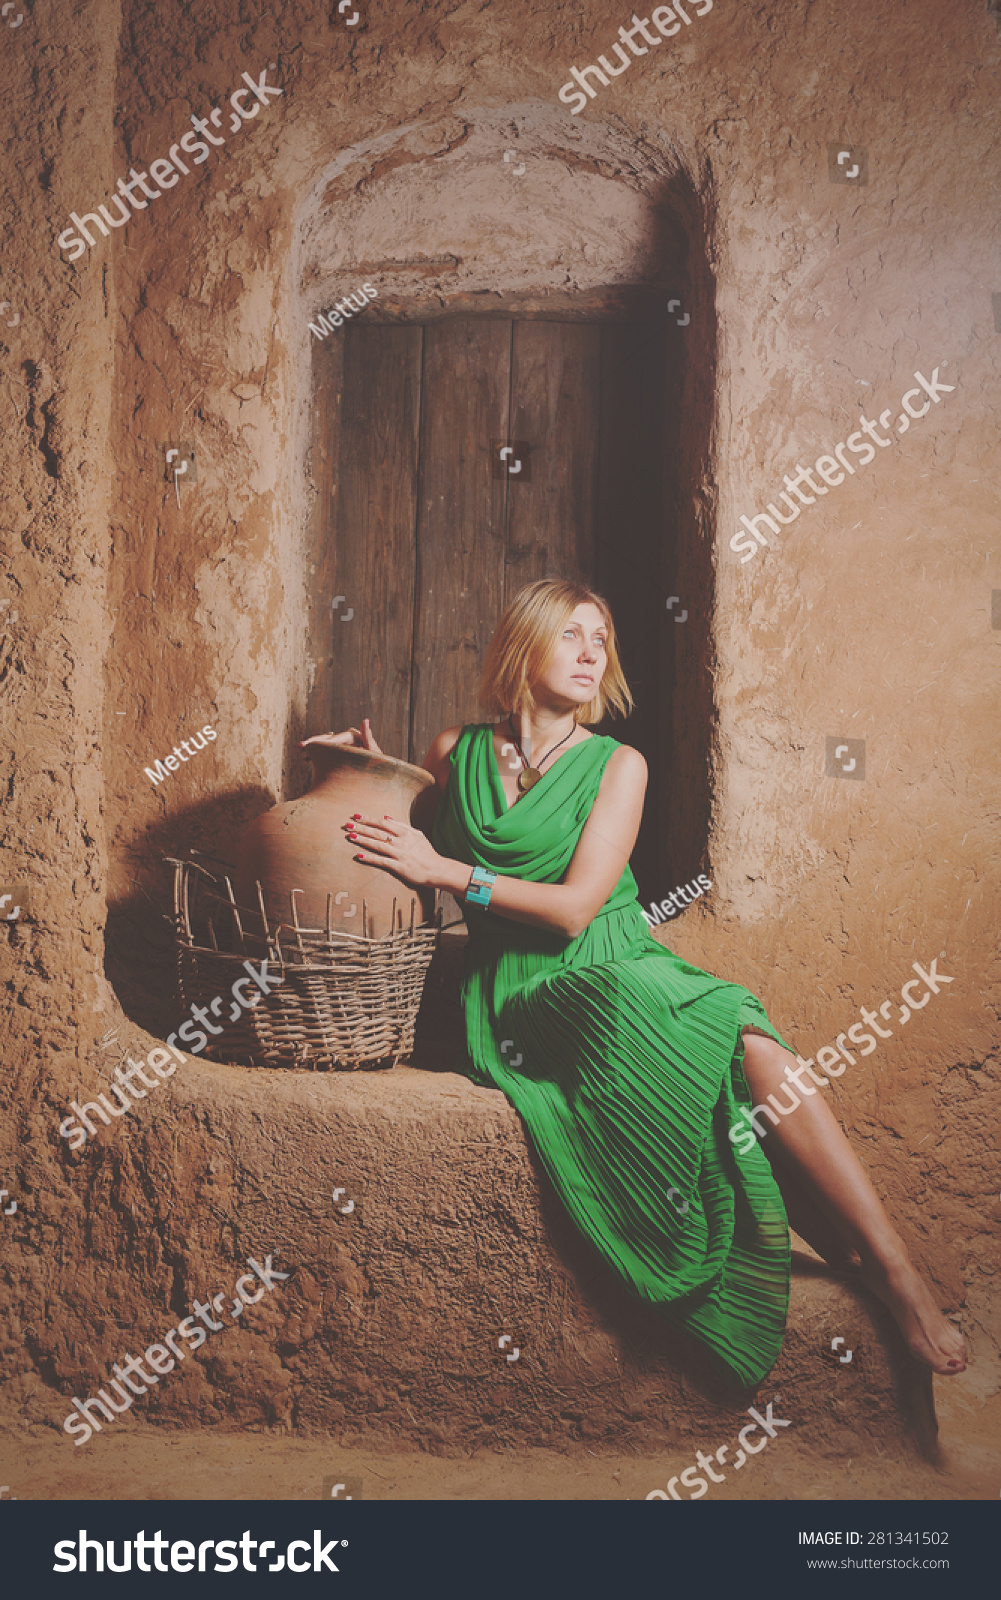 stock-photo-women-slave-posing-with-big-